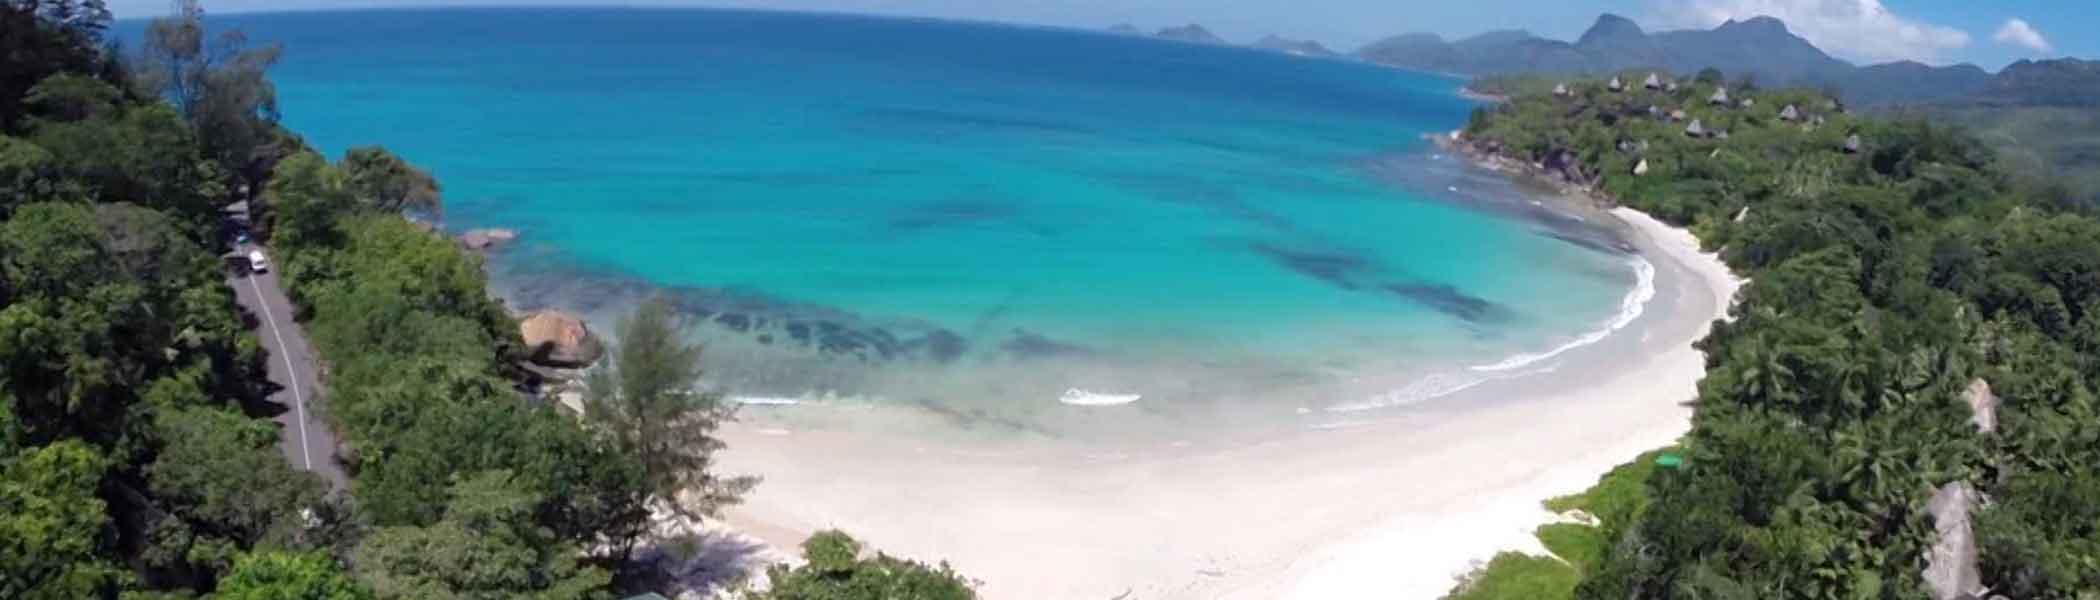 anse-louis, Beaches in Seychelles Islands